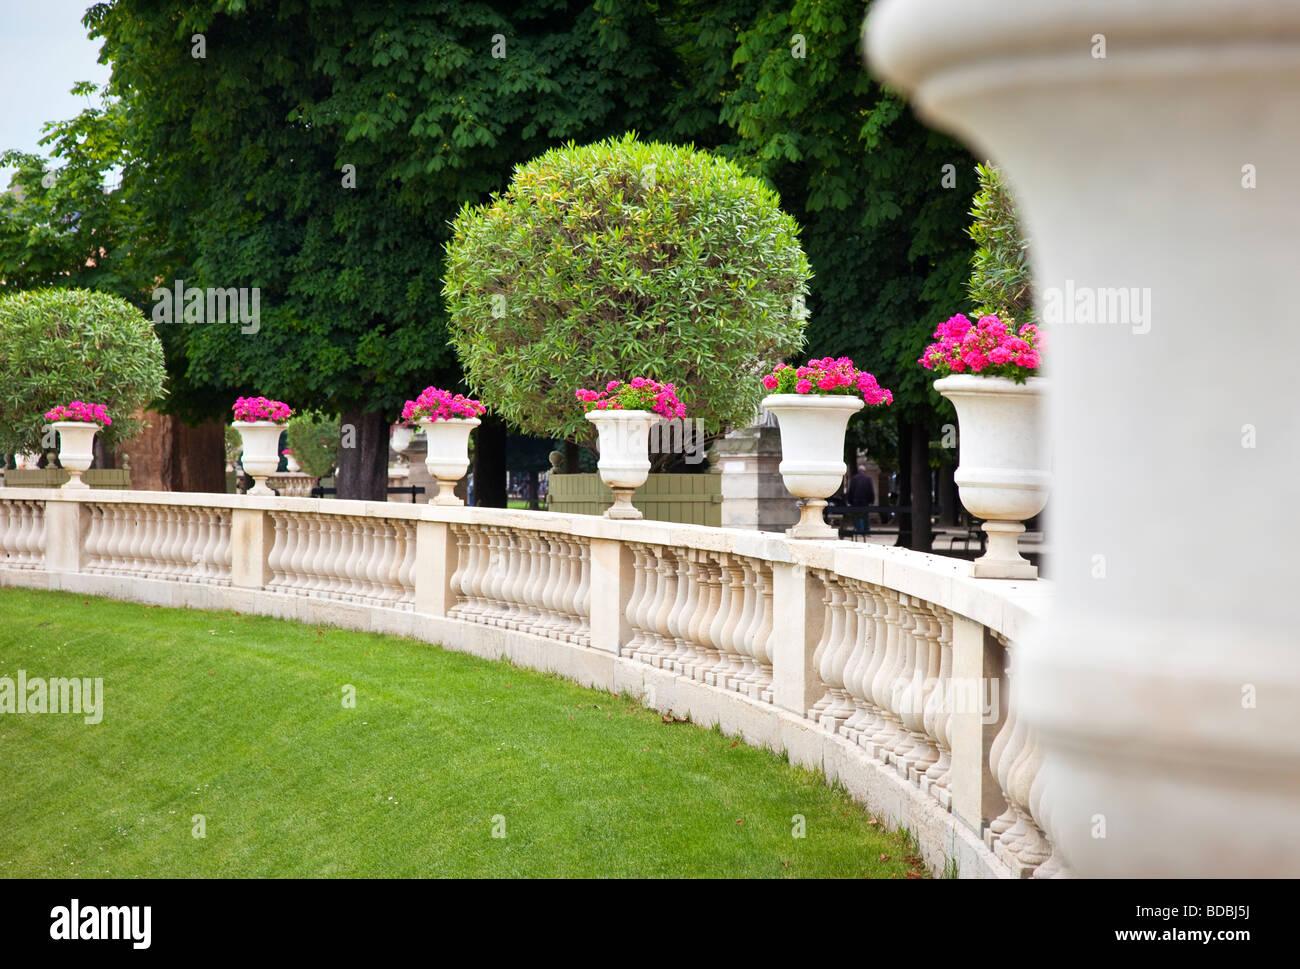 Jardin du Luxembourg, Paris France - Stock Image